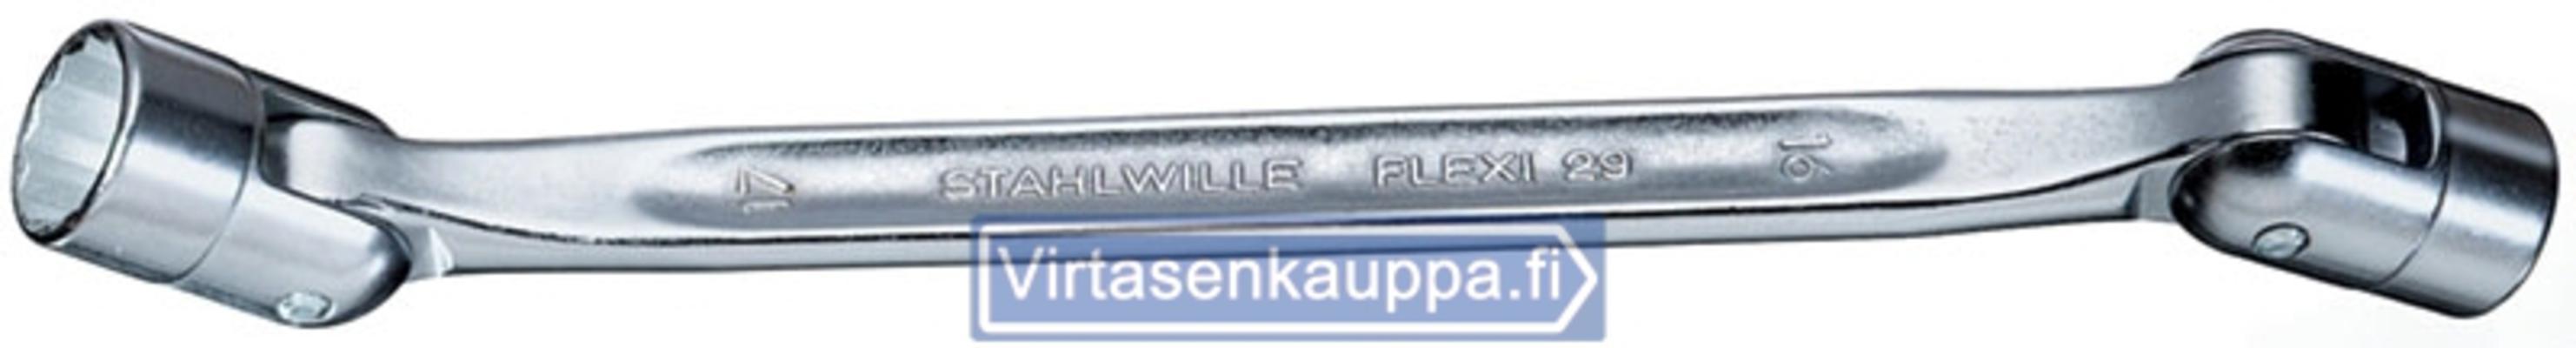 Nivelhylsyavain Flexi - Stahlwille 29 - Avainväli 8 x 9 mm, pituus 201 mm